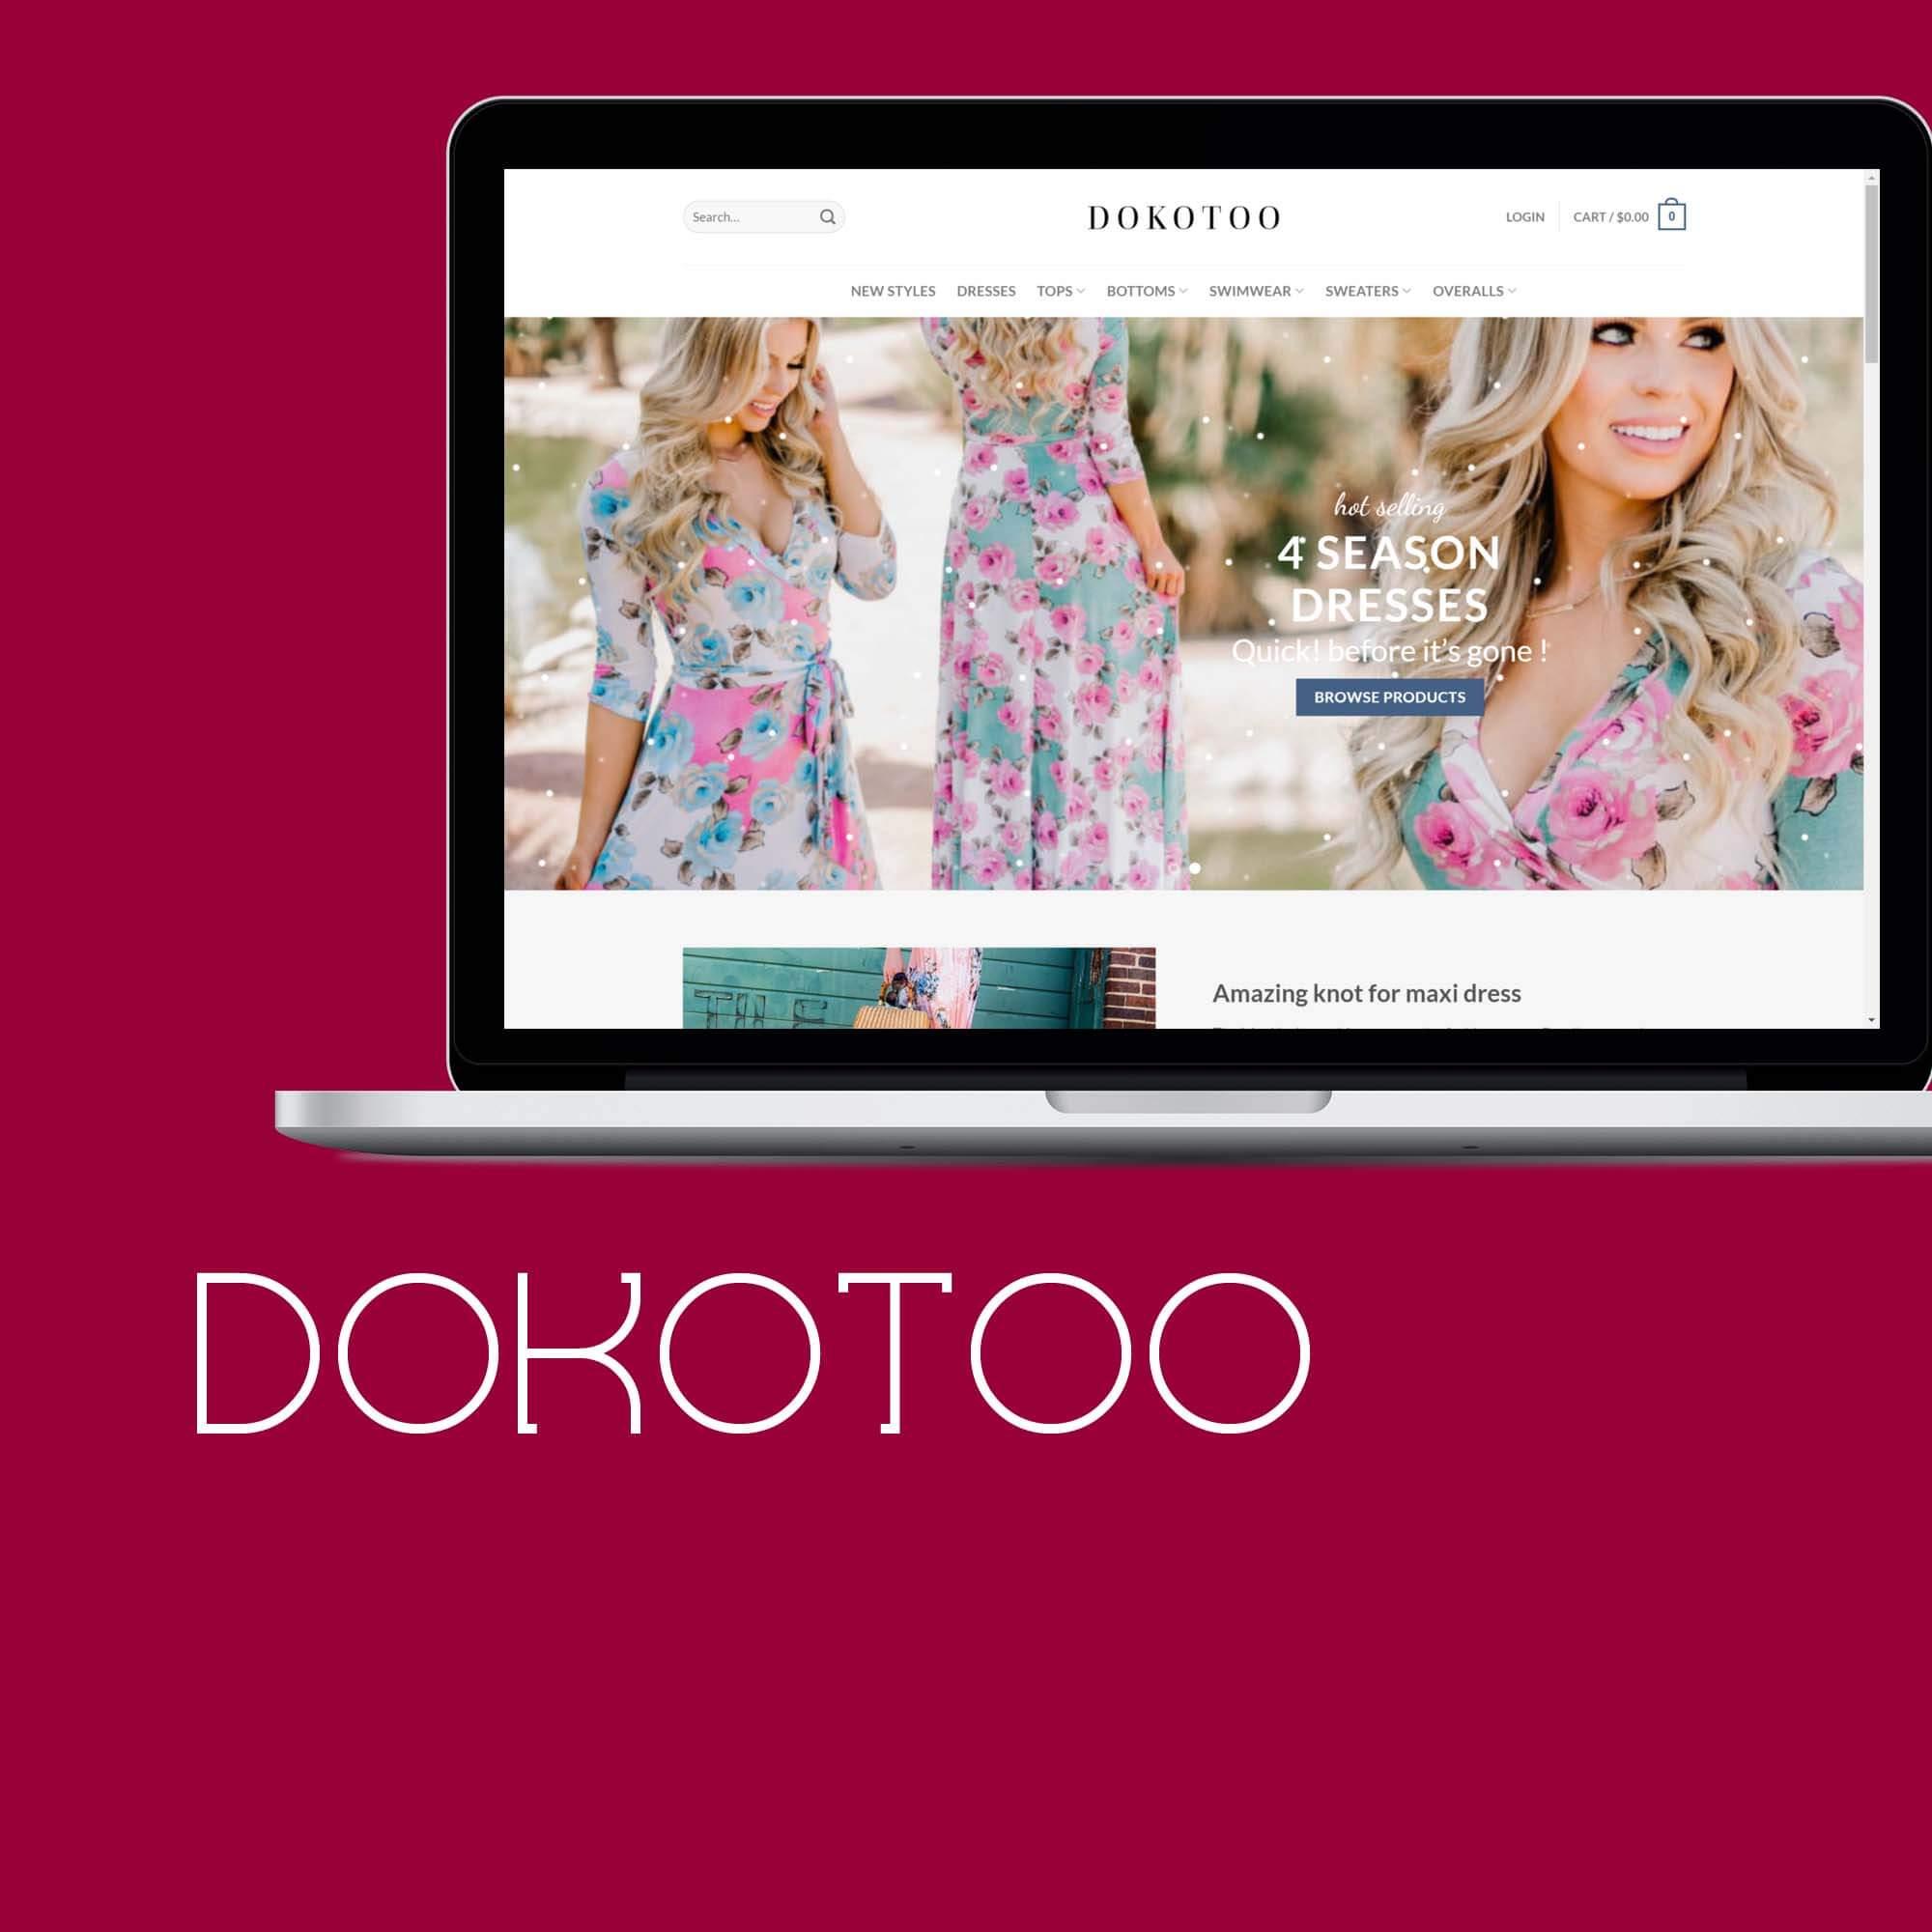 www.dokotoo